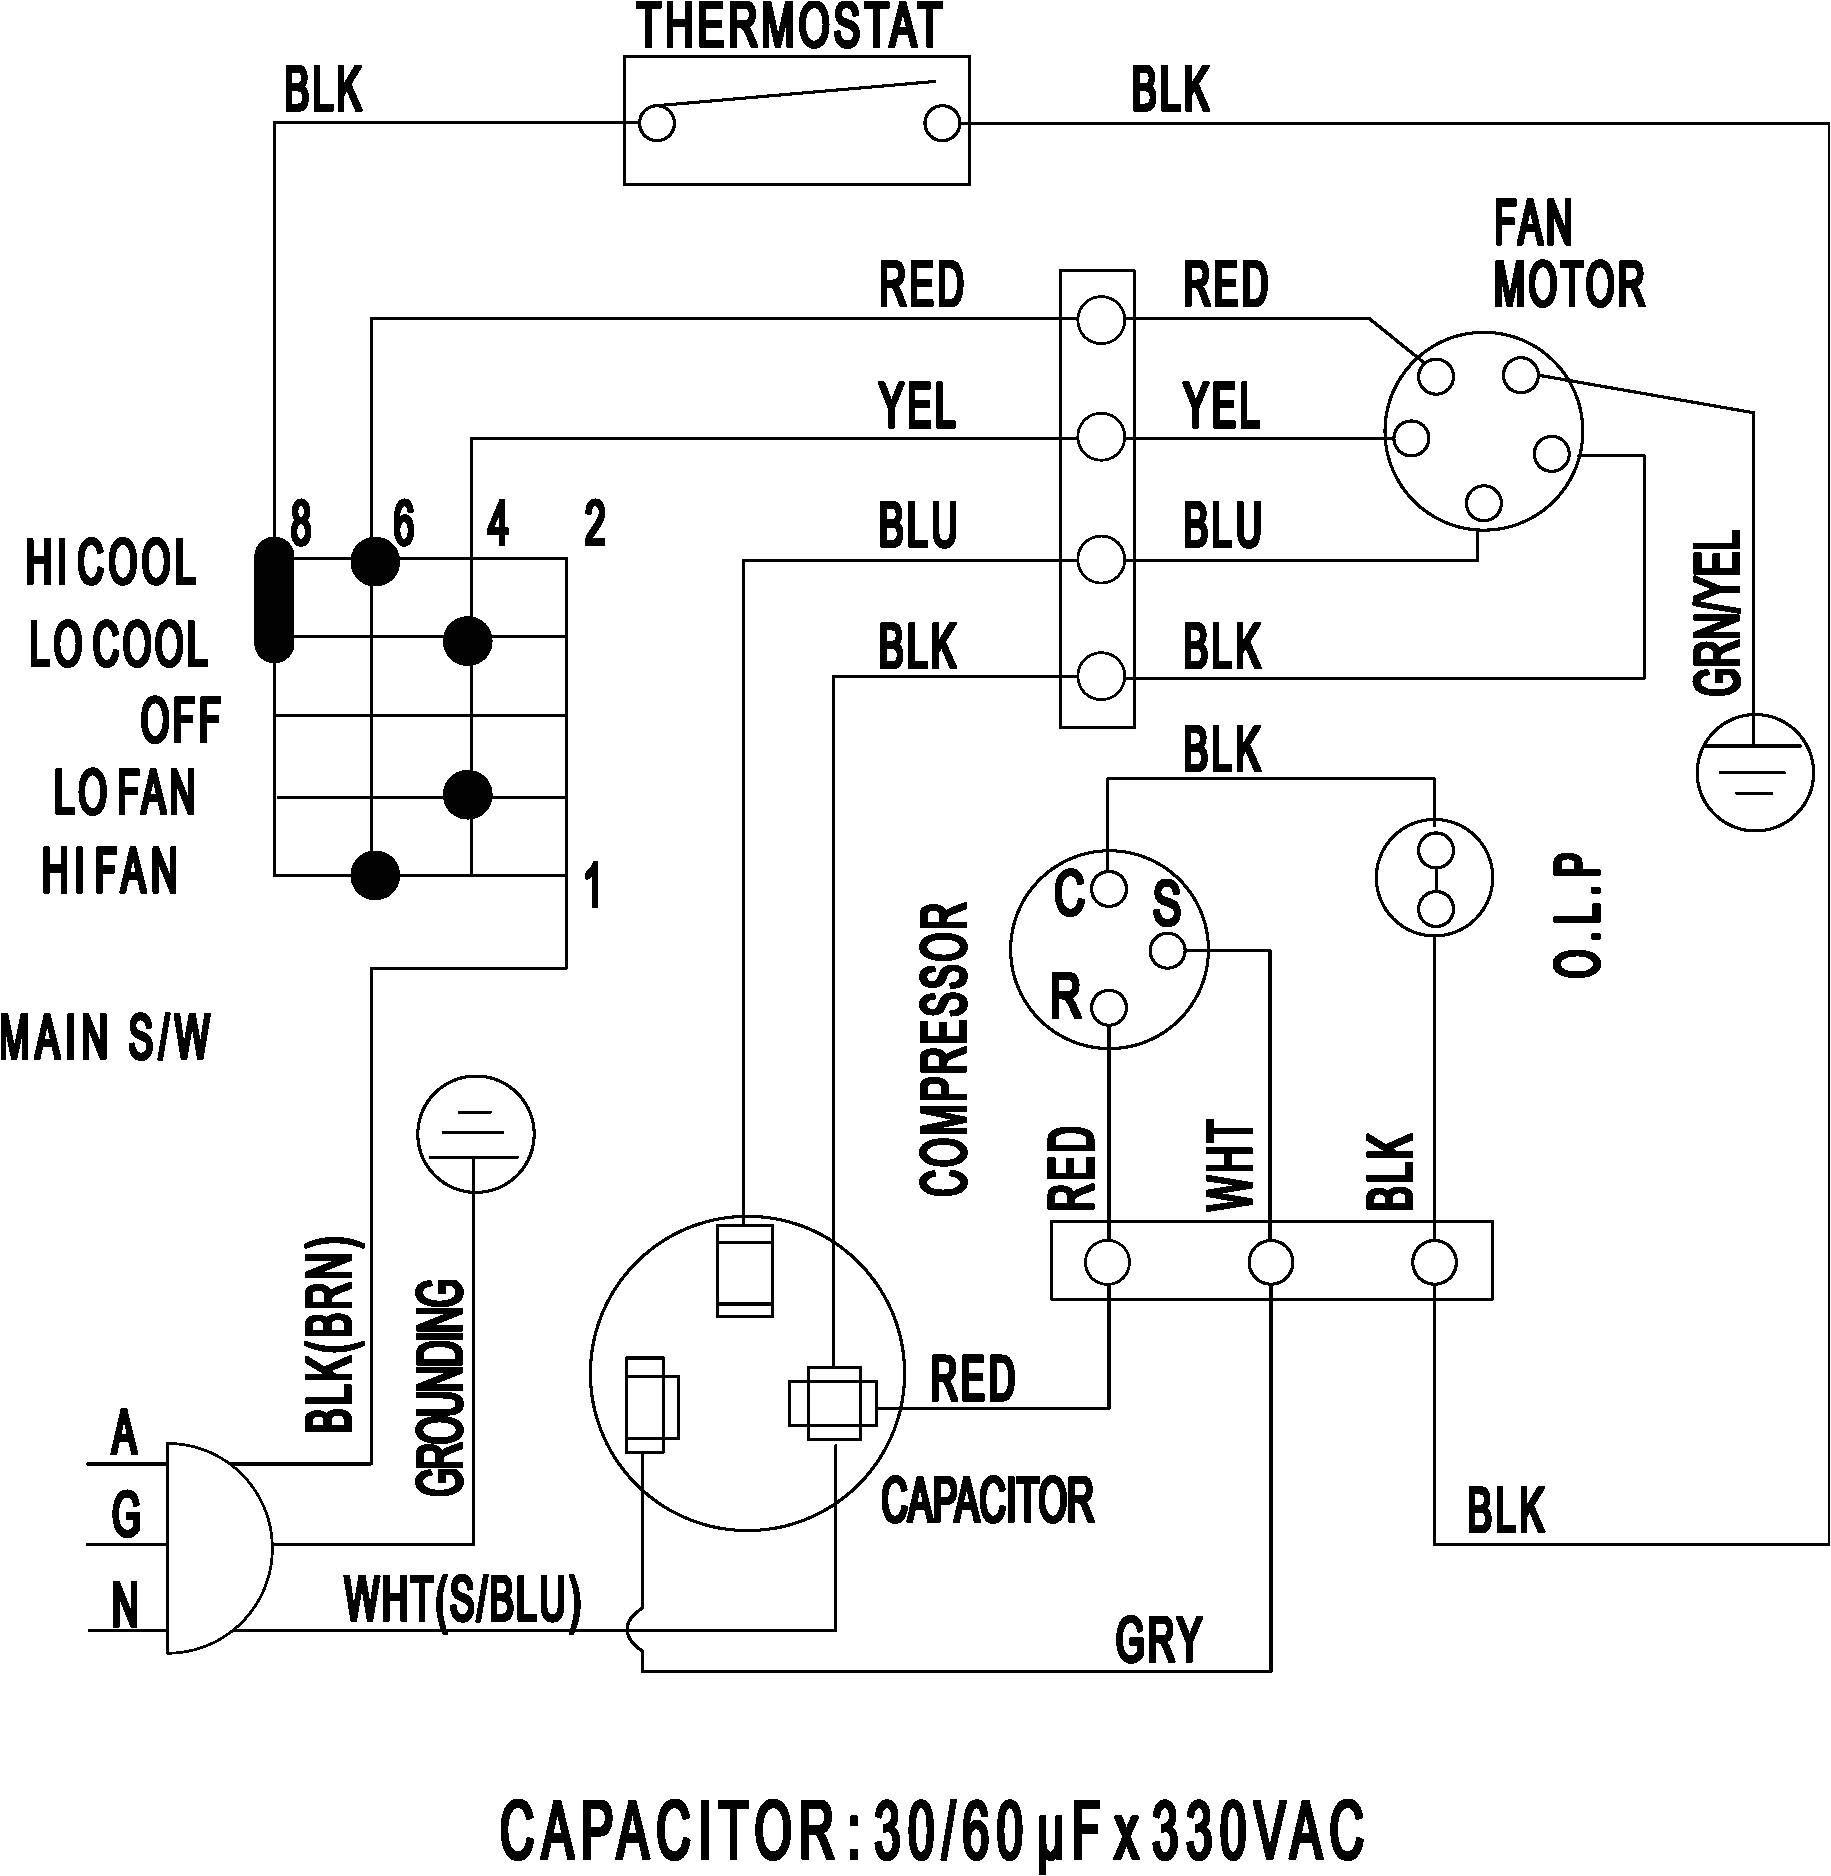 air conditioner schematics air conditioners wiring diagram article york air conditioner wiring diagram split ac schematic